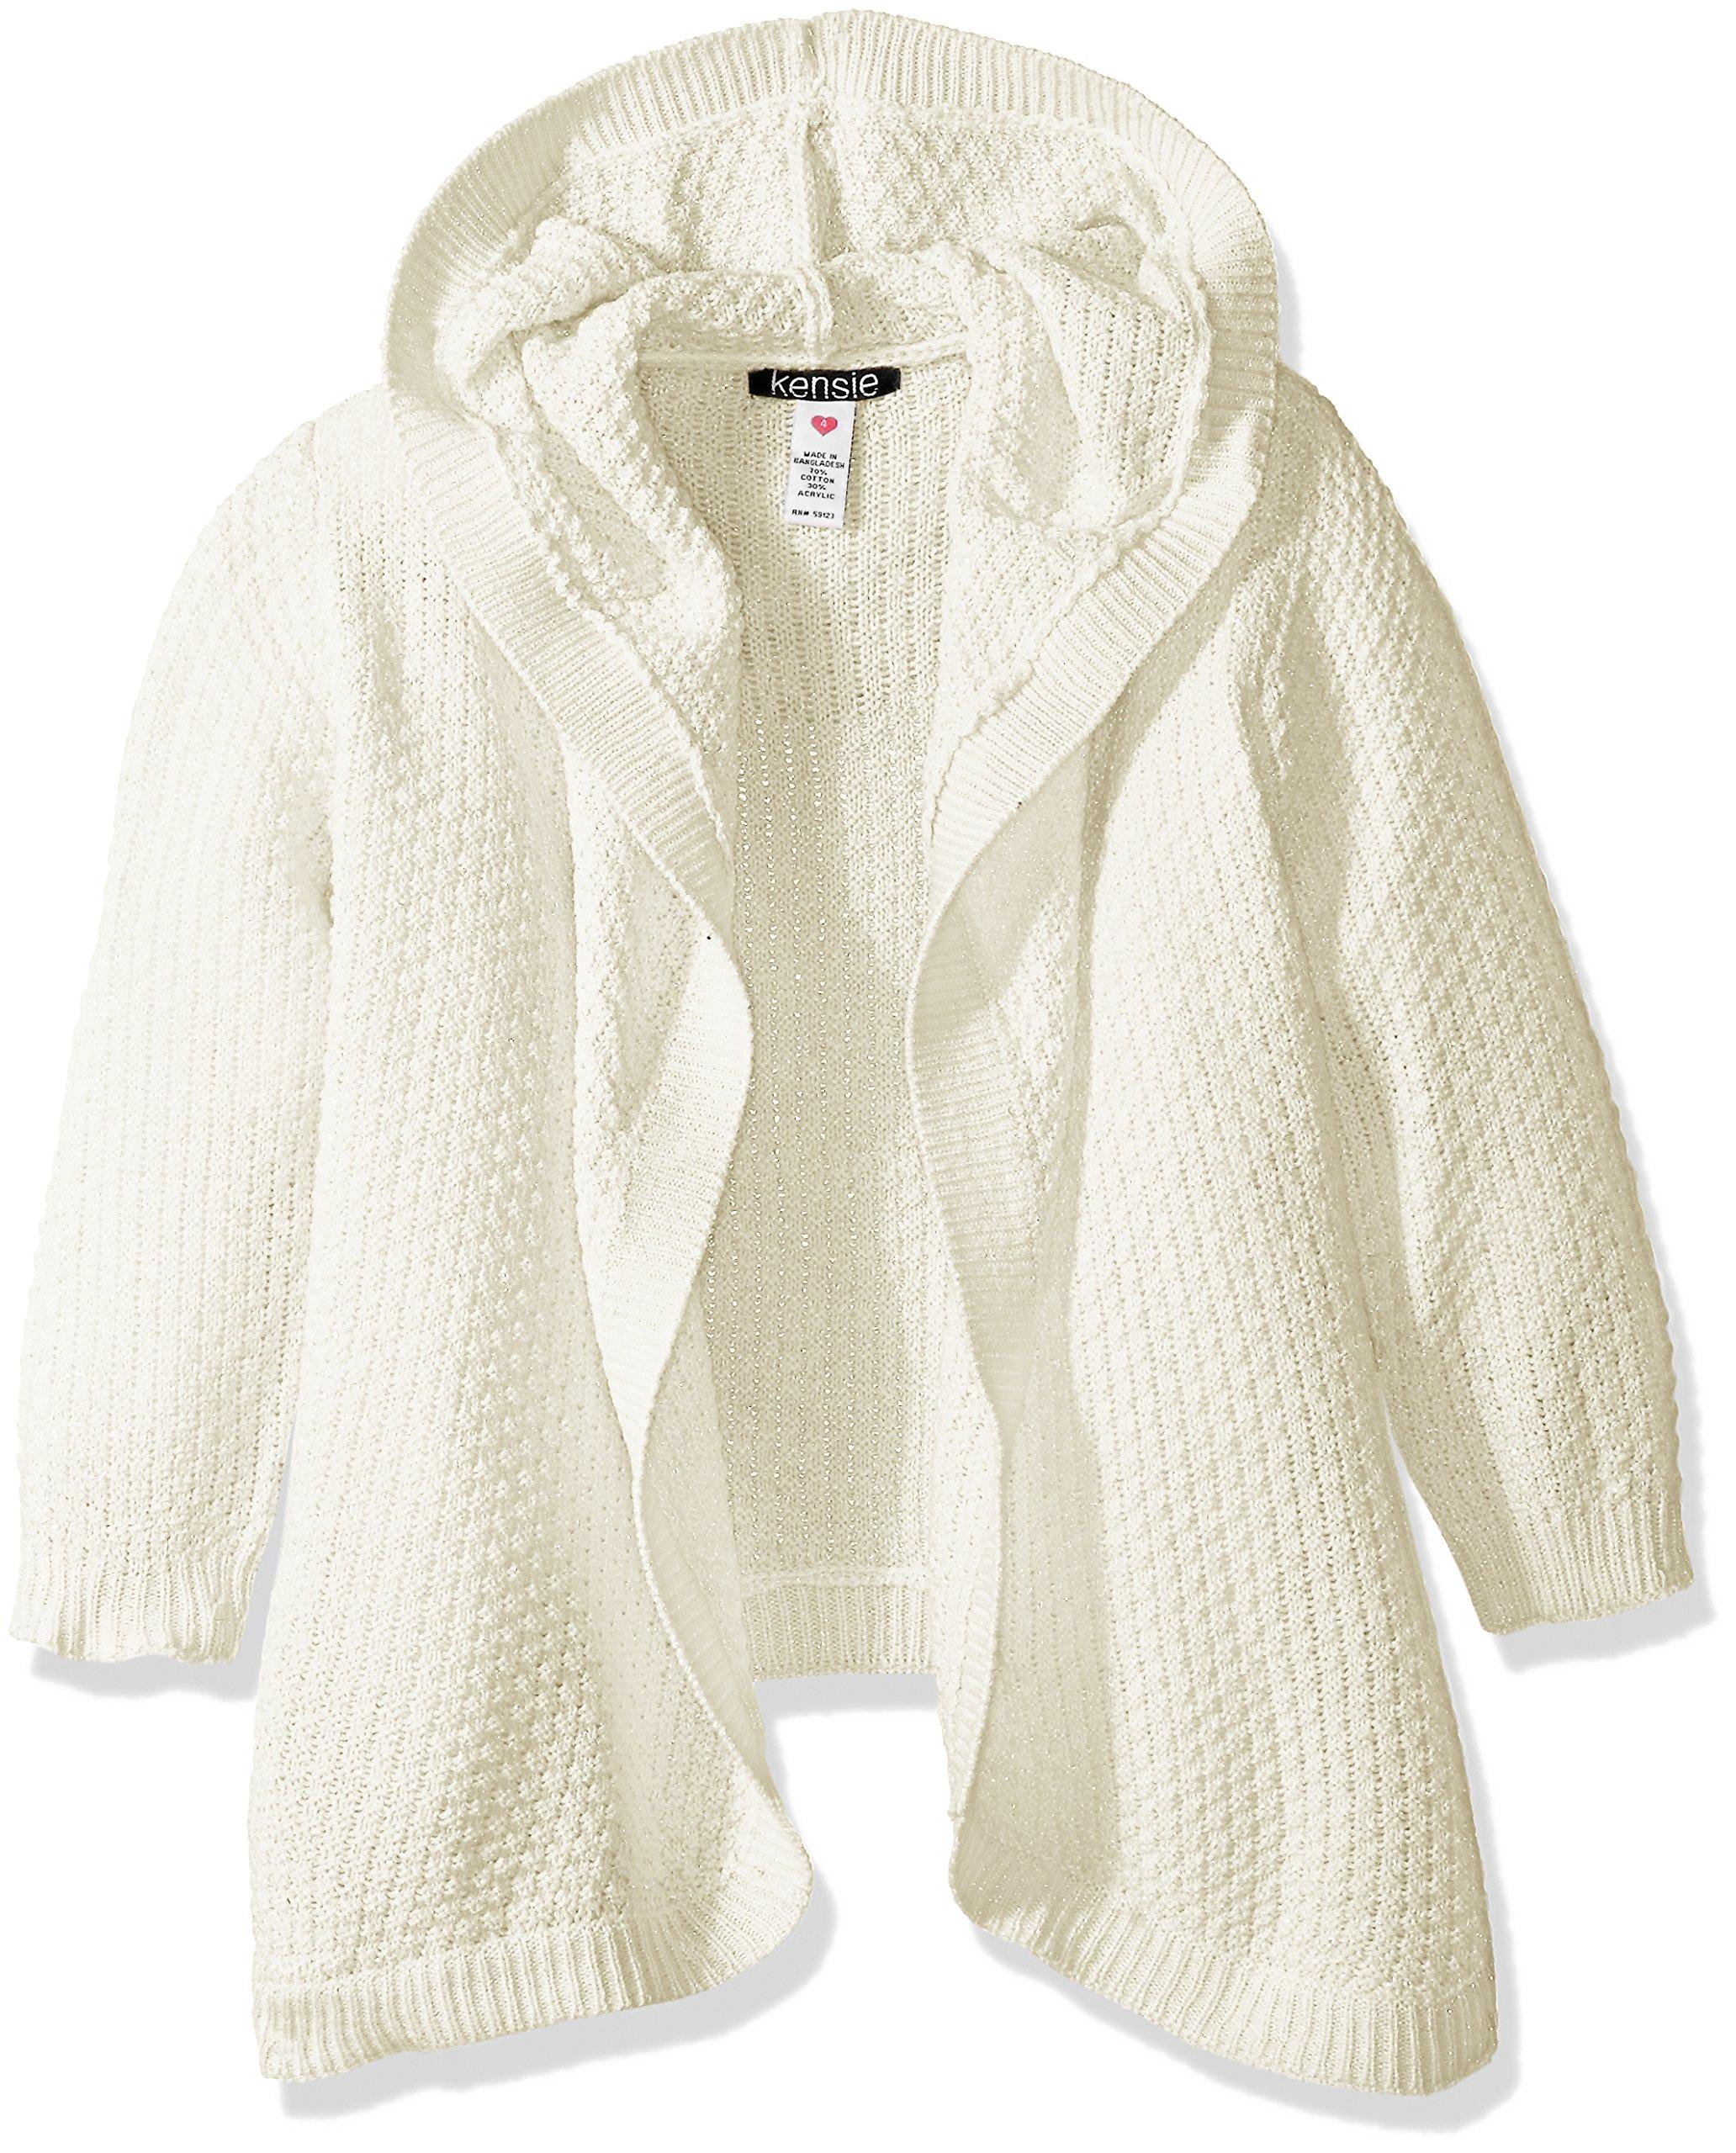 Kensie Big Girls' Cardigan Sweater (More Styles Available), Vanilla, 14/16